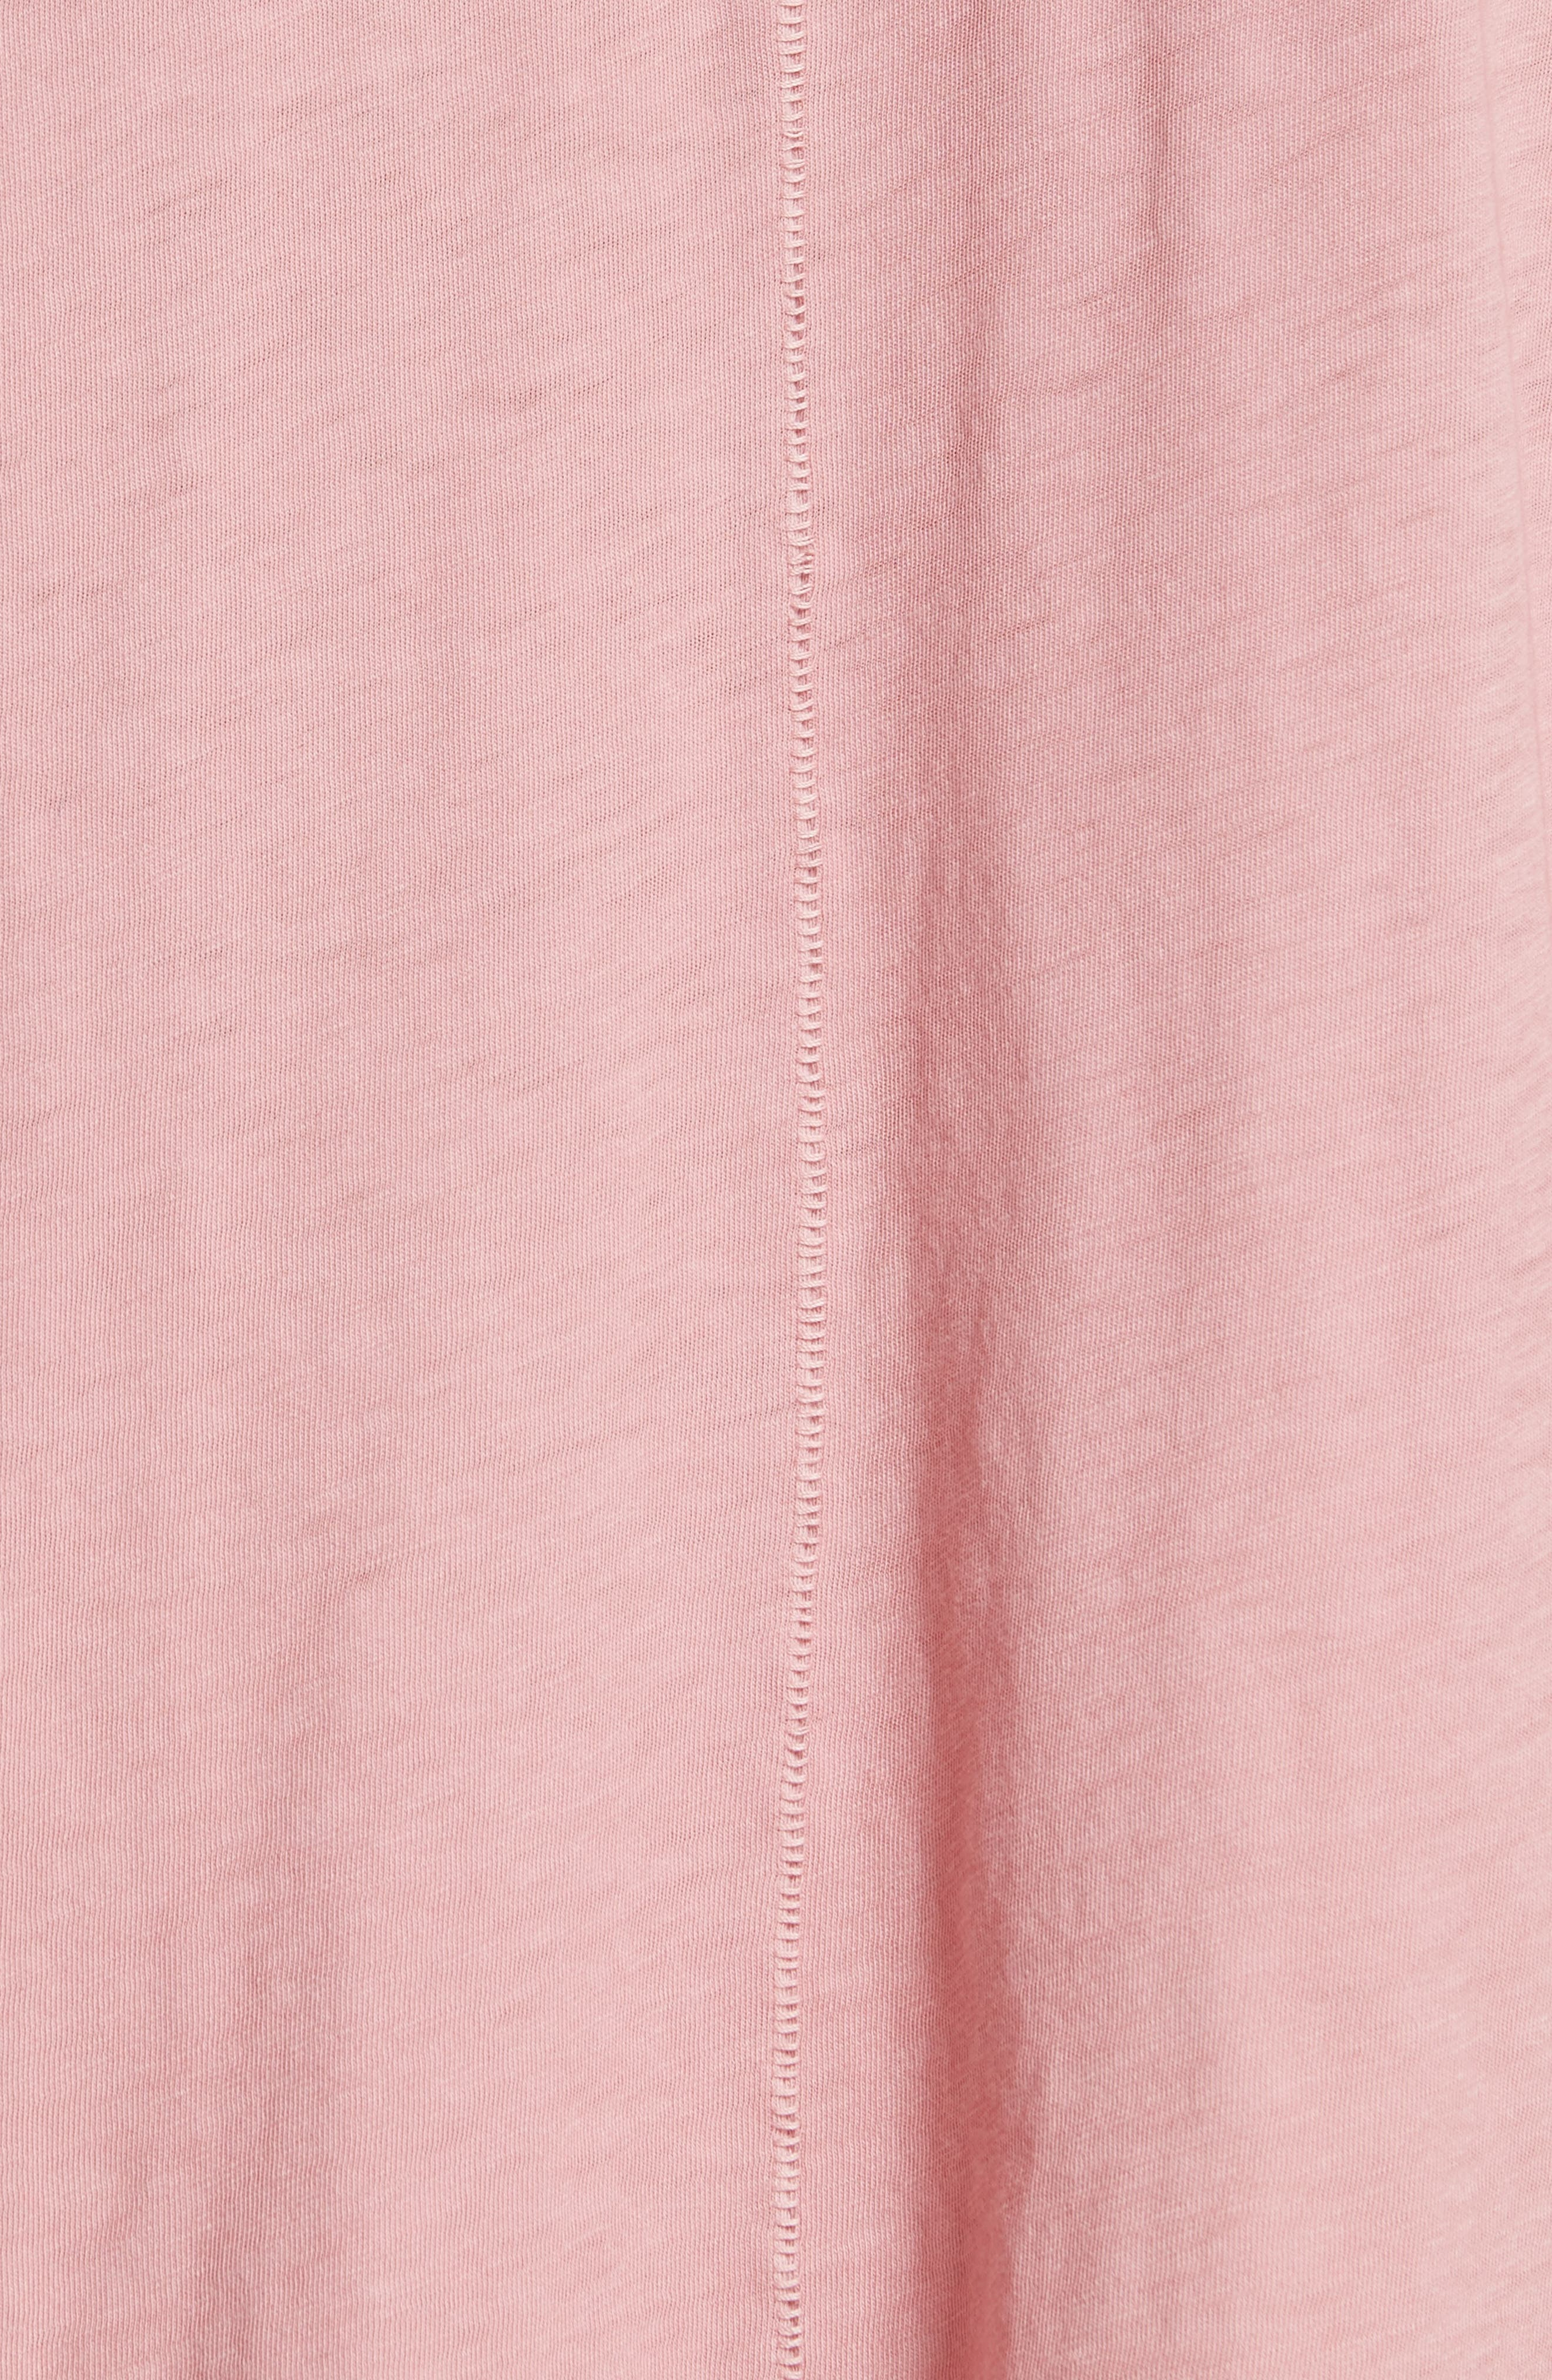 Vintage Pocket Tee,                             Alternate thumbnail 5, color,                             Deep Pink